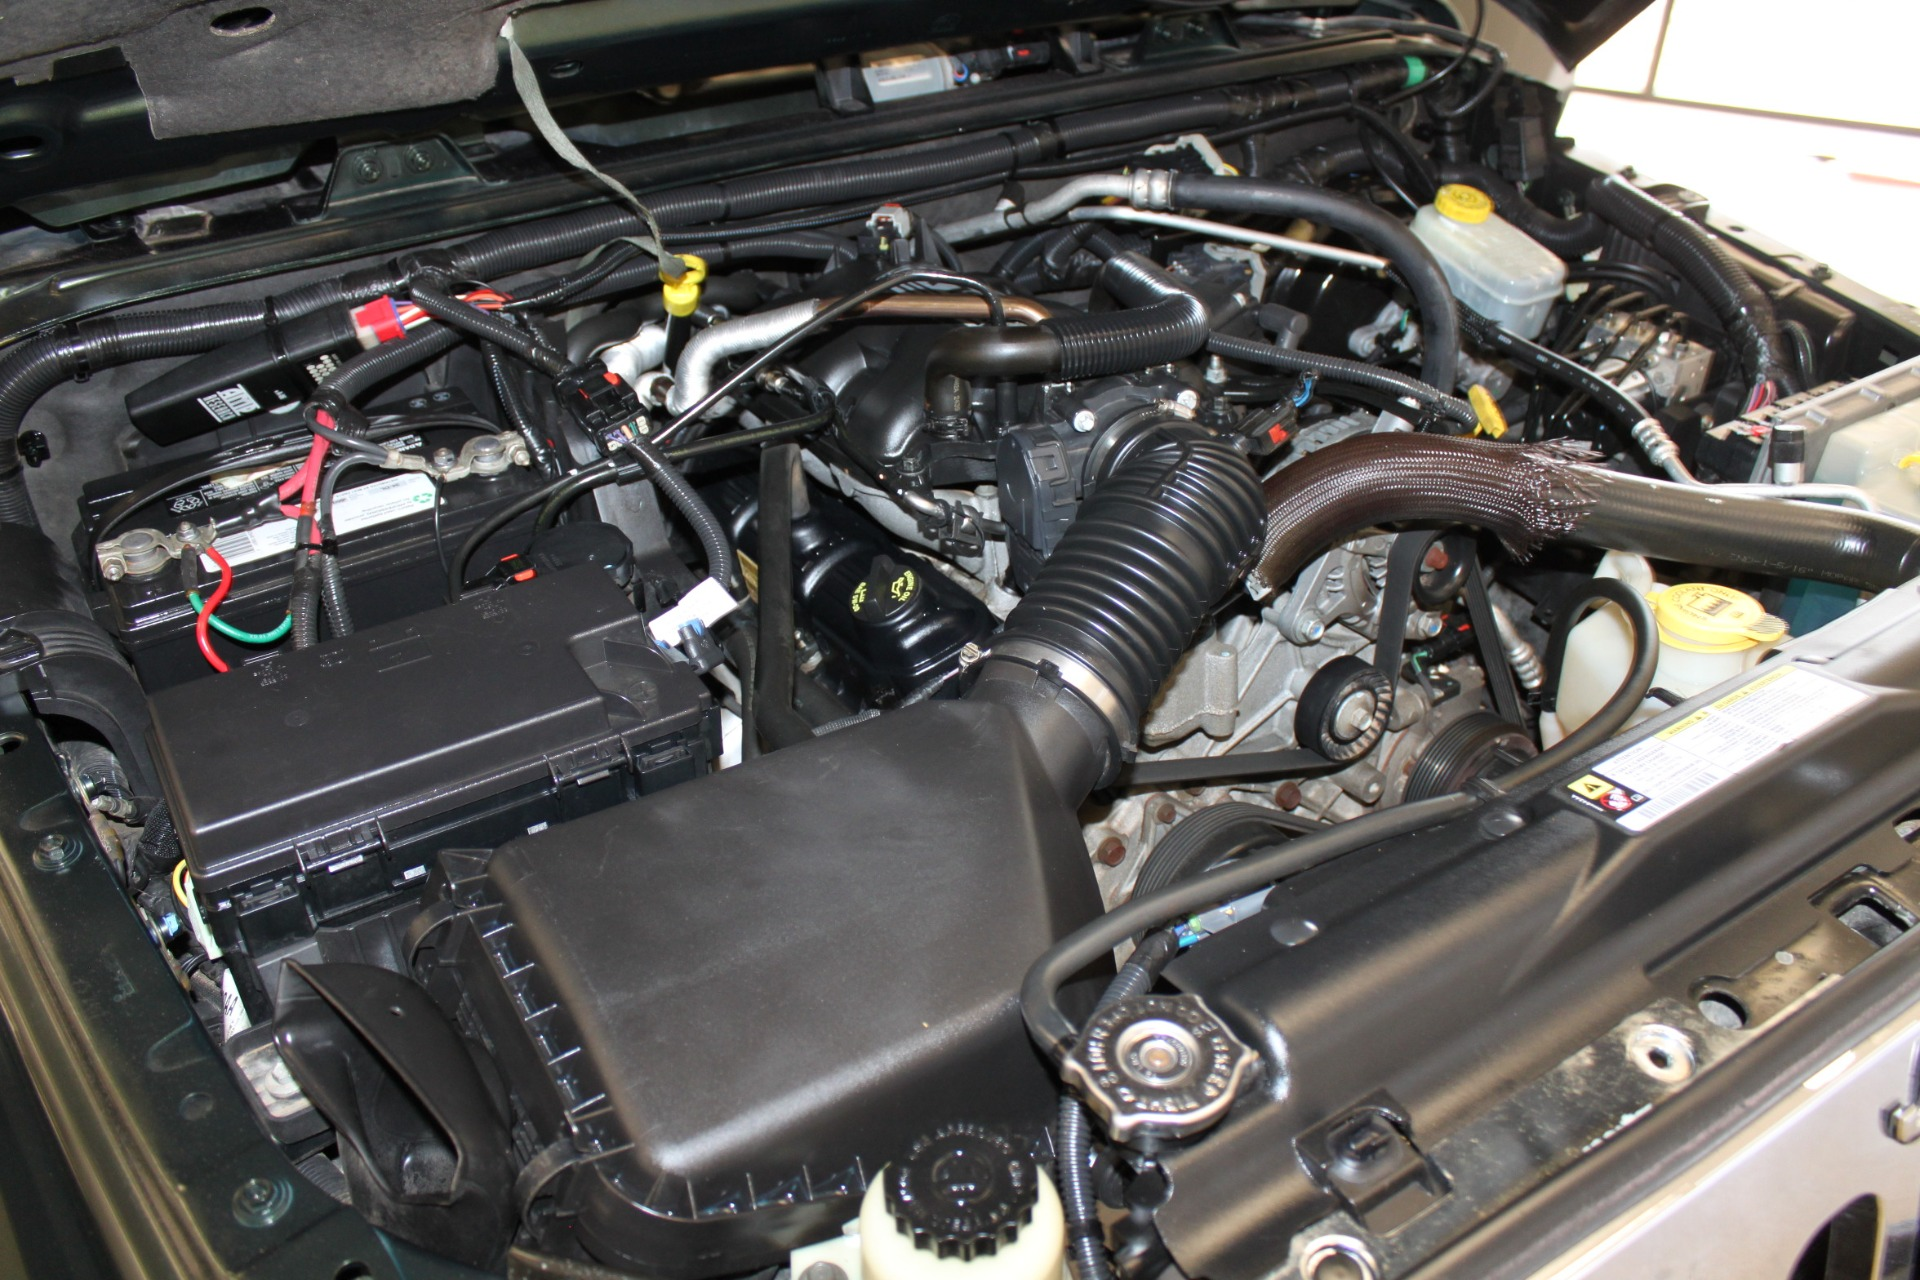 Used-2010-Jeep-Wrangler-Unlimited-Sahara-4X4-Dodge